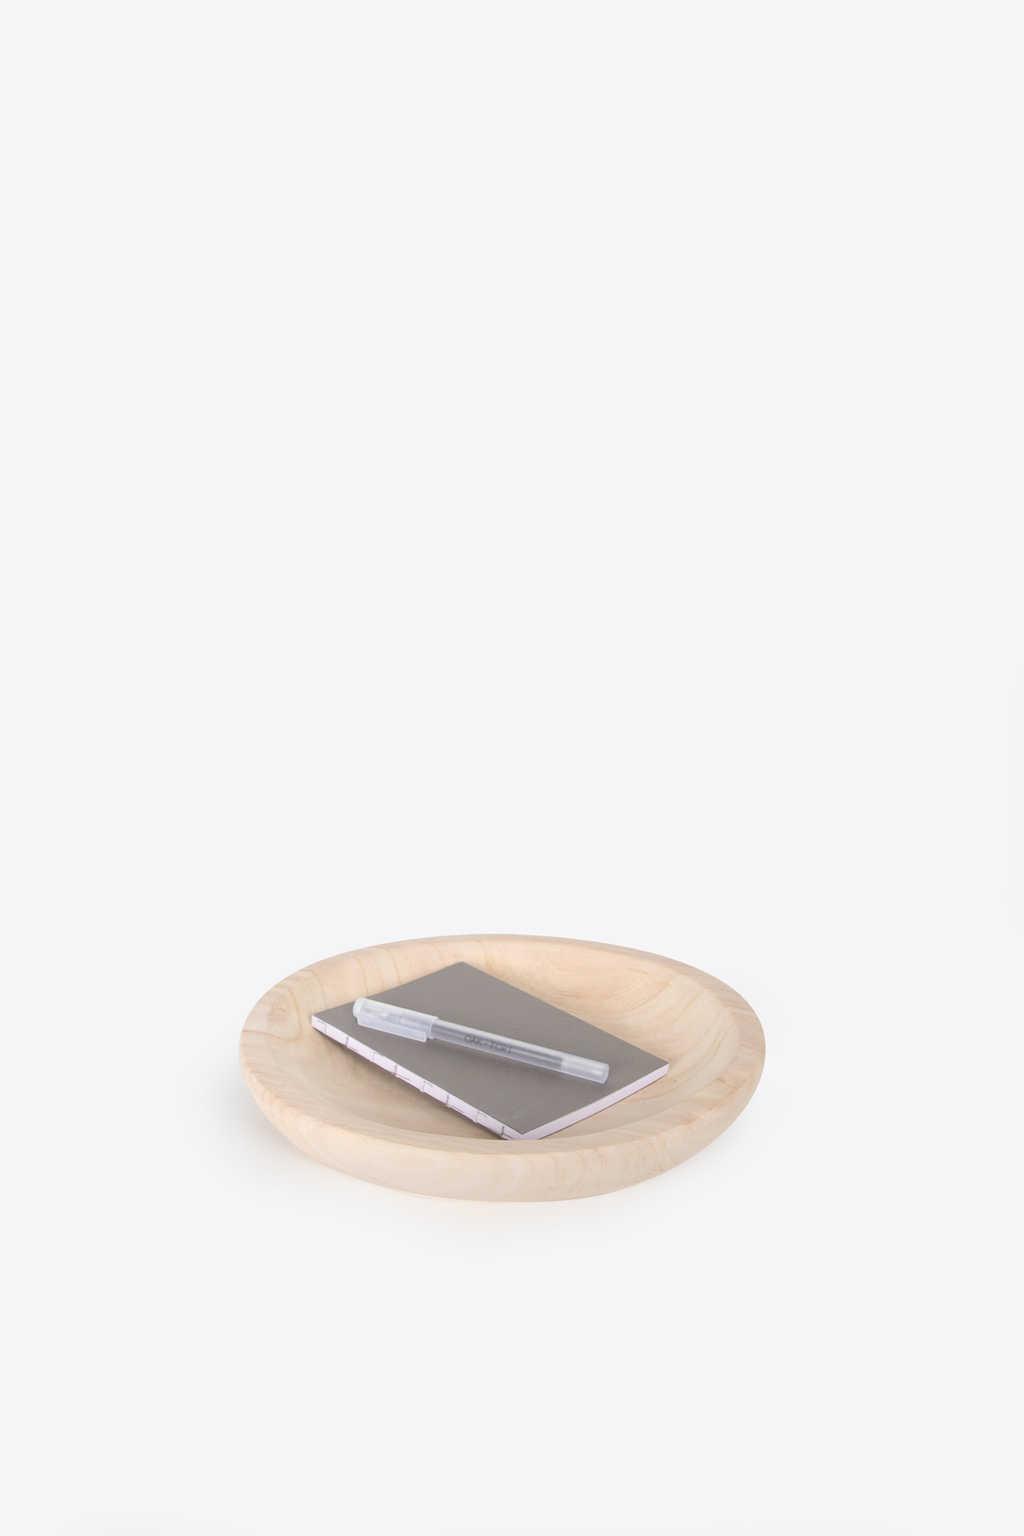 Wooden Dish 1034 Tan 4